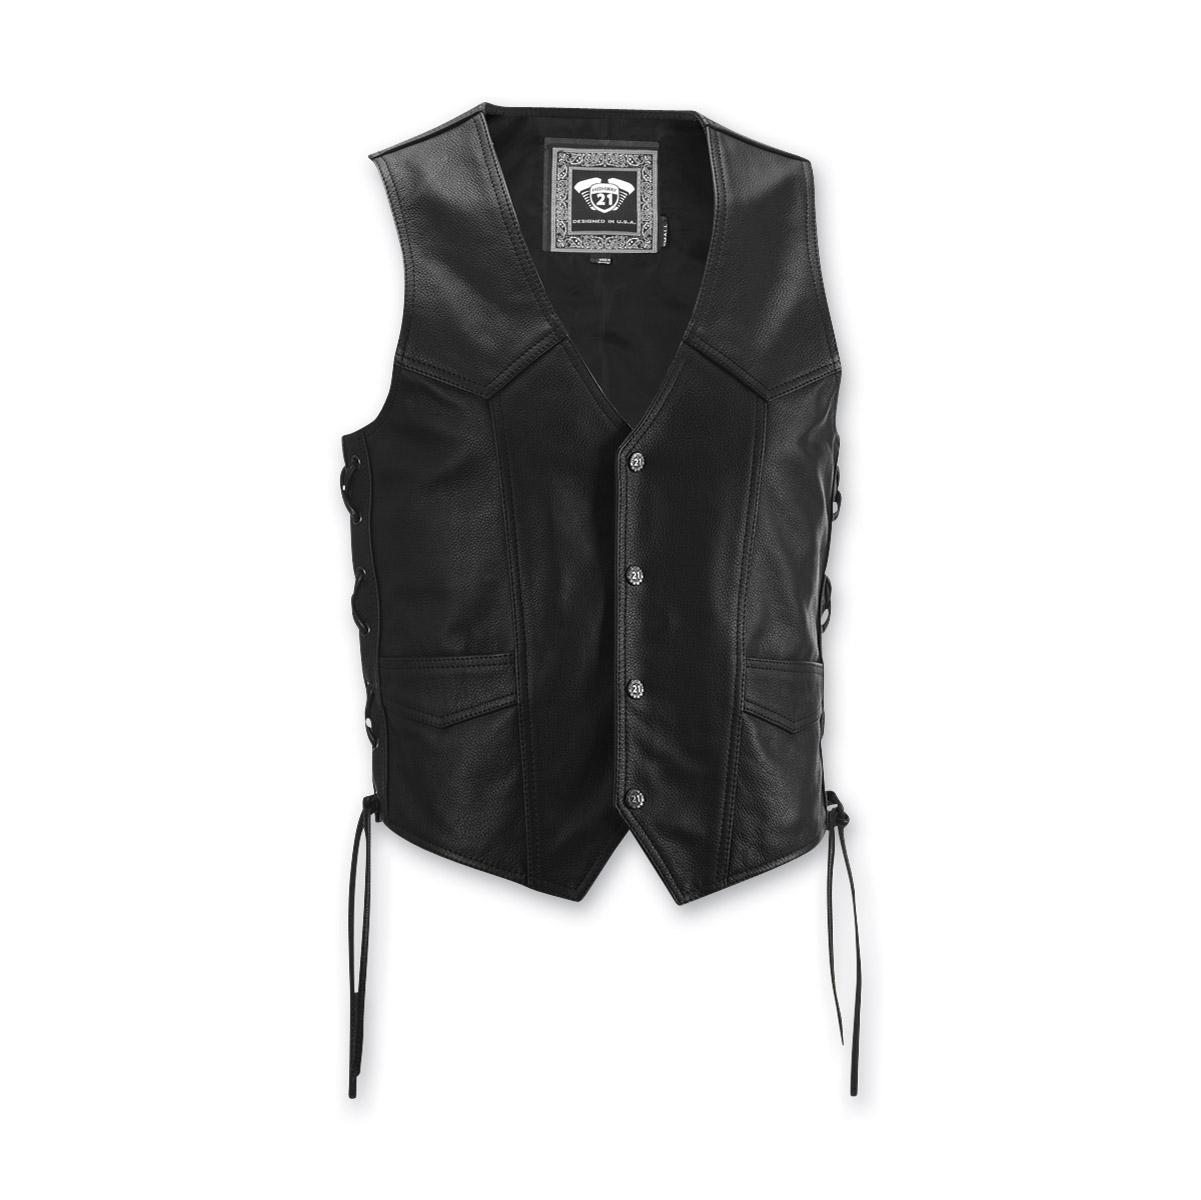 Highway 21 Men's Six Shooter Black Leather Vest